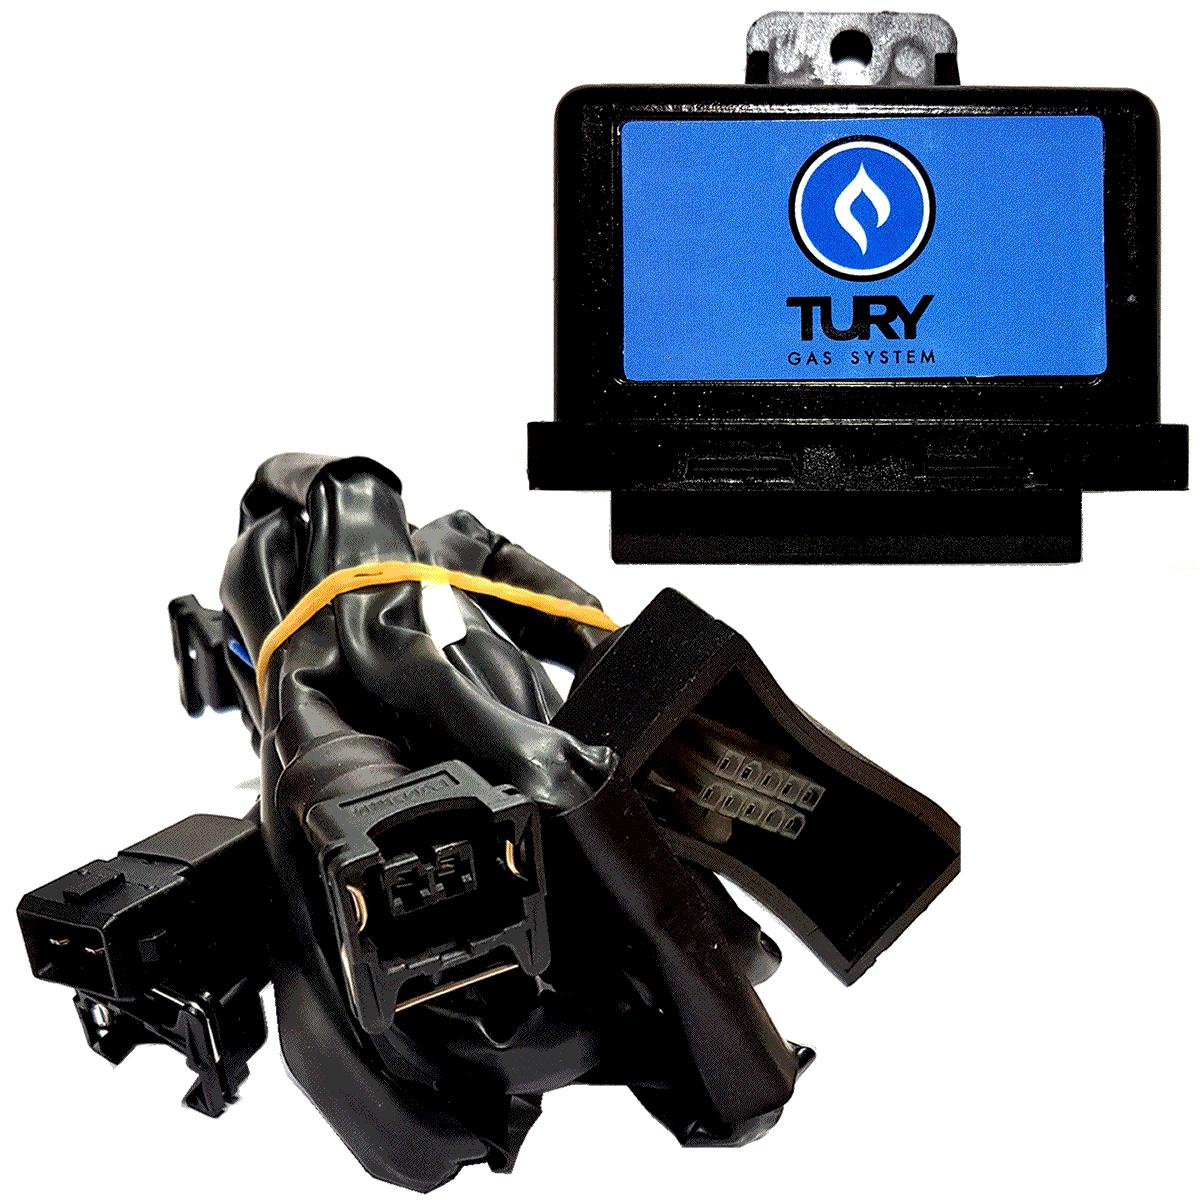 Emulador de 4 Bicos Kombi T54C c/Chicote Boxer TURY GAS